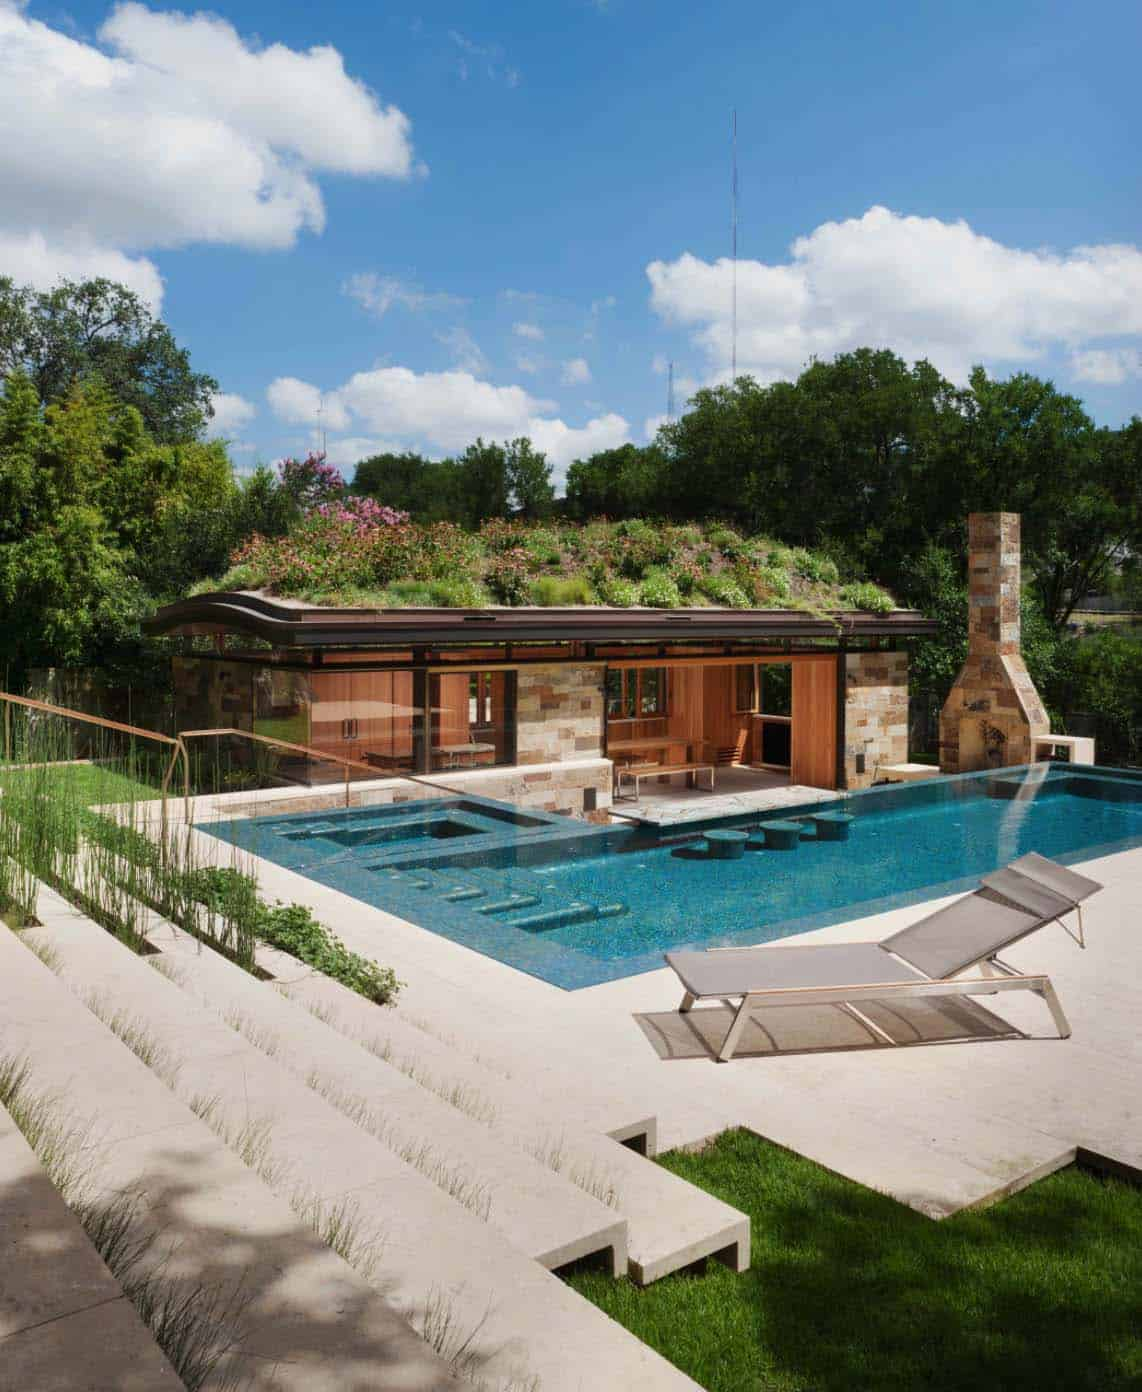 33 Mega-Impressive swim-up pool bars built for entertaining on Backyard Pool Bar Designs id=37005